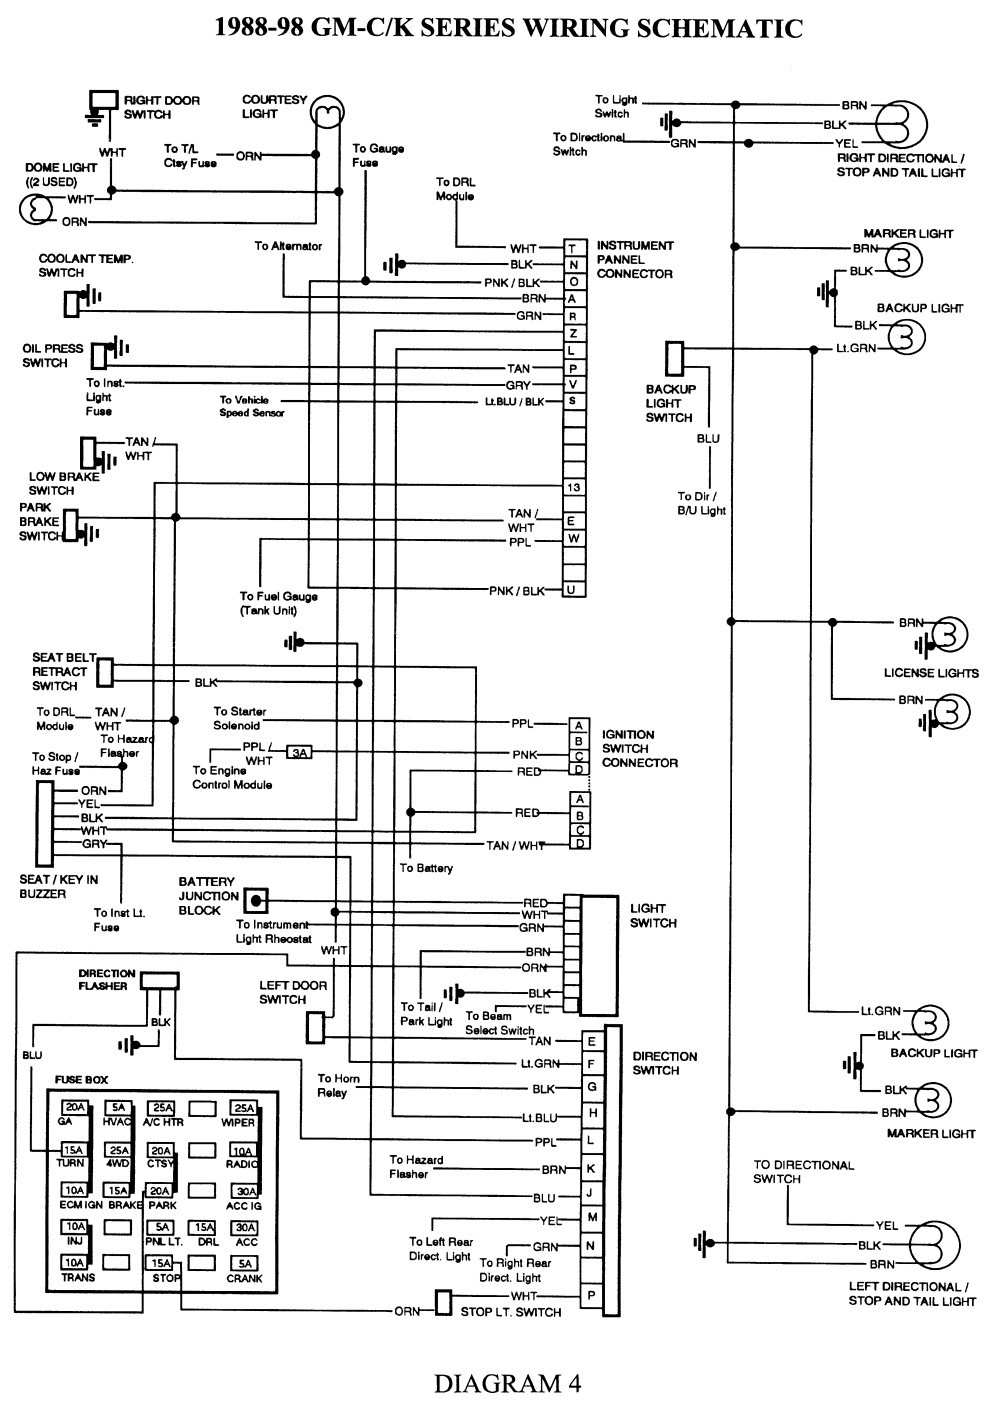 2005 Chevy Silverado Wiring Diagram Inspirational Awesome 2003 Chevy Silverado Wiring Diagram 62 with Additional Mach